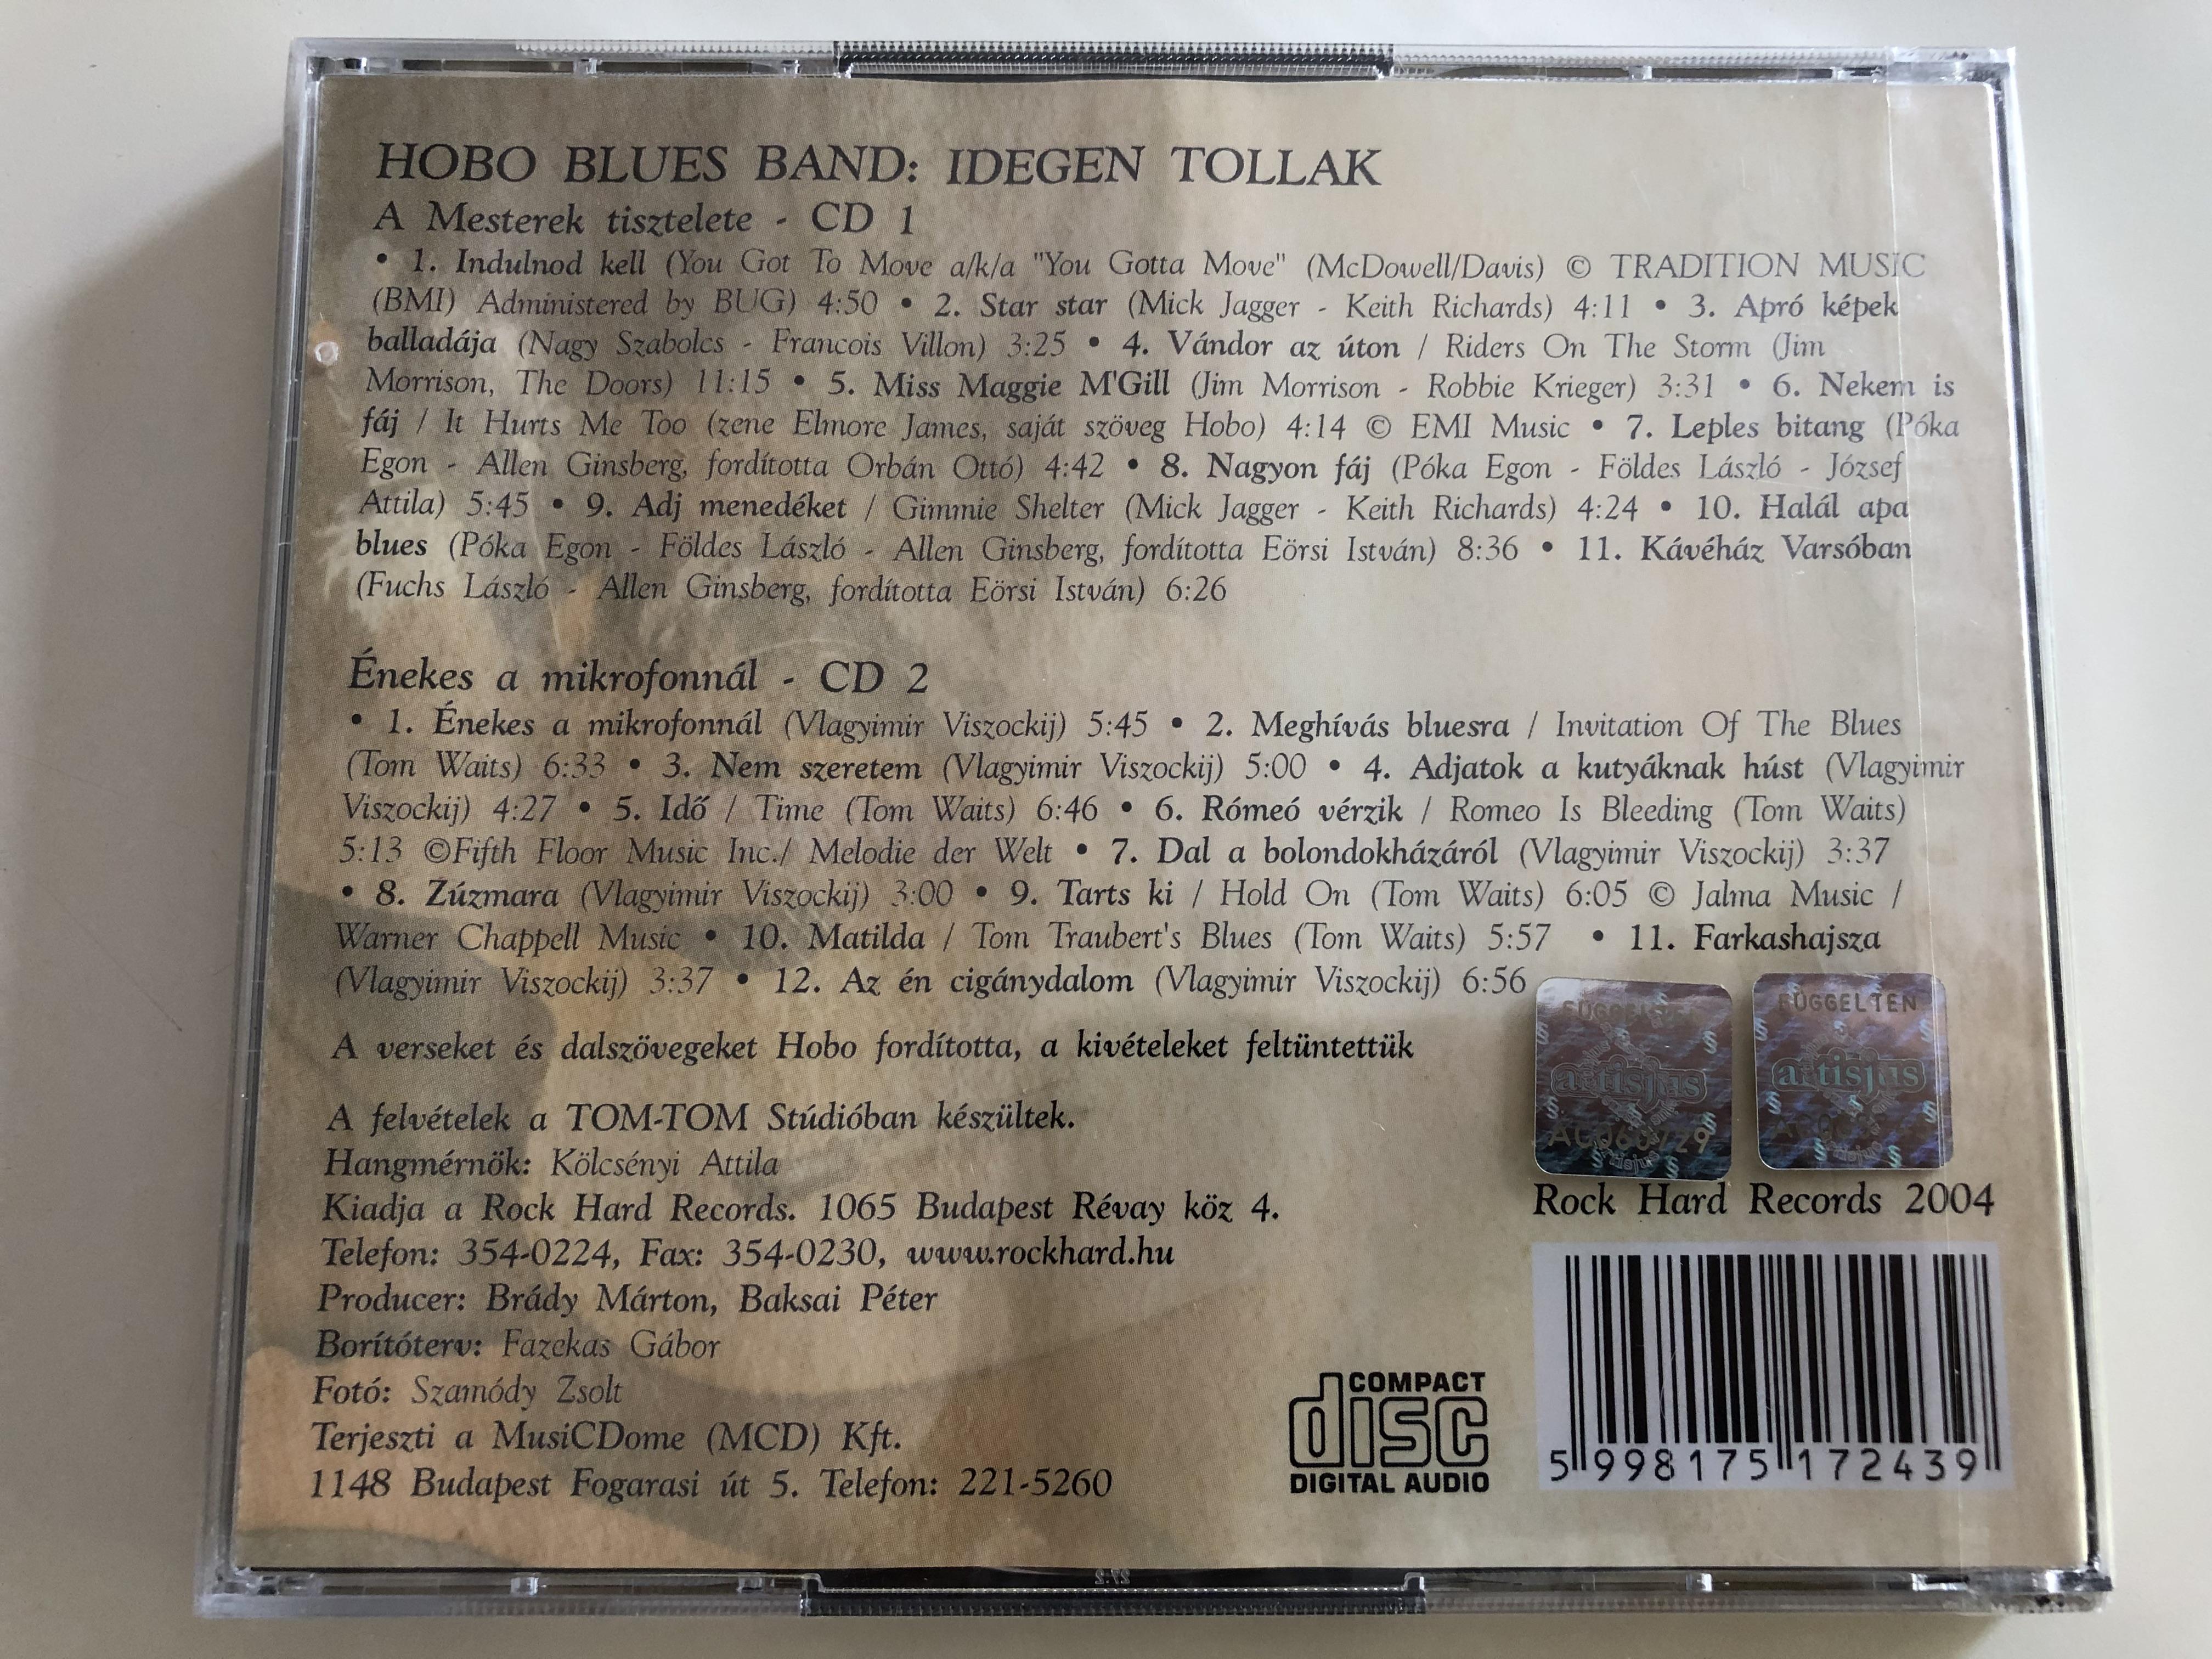 hobo-blues-band-idegen-tollak-2x-audio-cd-2004-rock-hard-records-musicdome-rh-04002-cd-2-.jpg